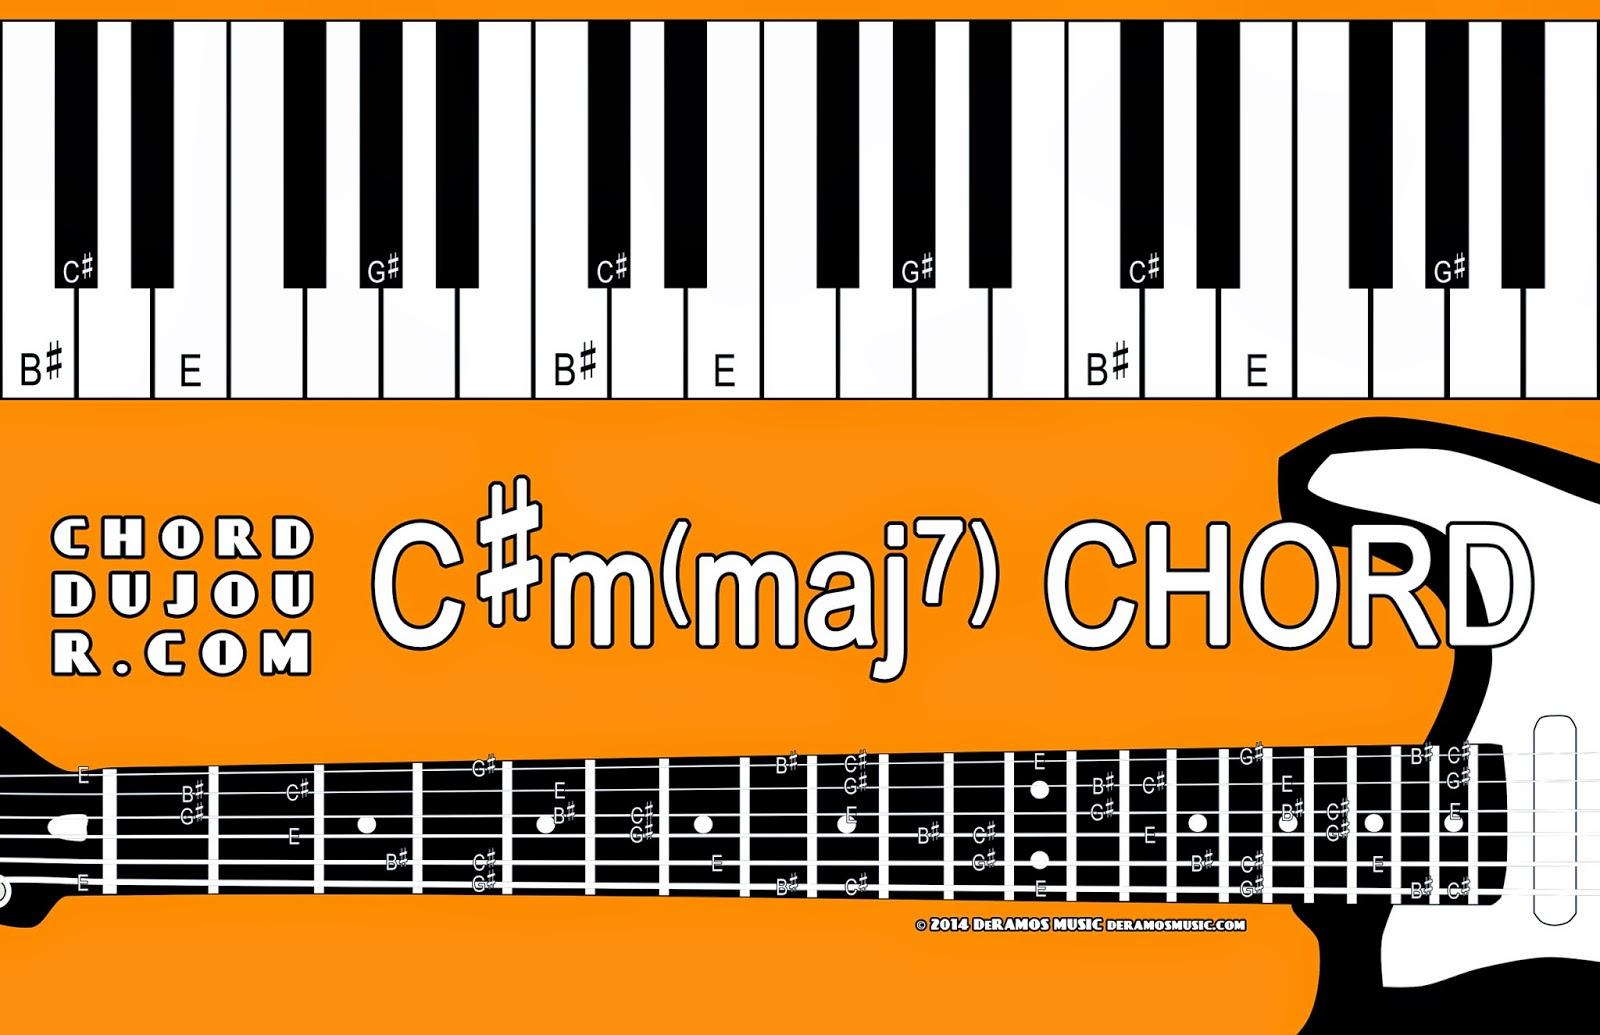 Chord Du Jour Dictionary Cmmaj7 Chord